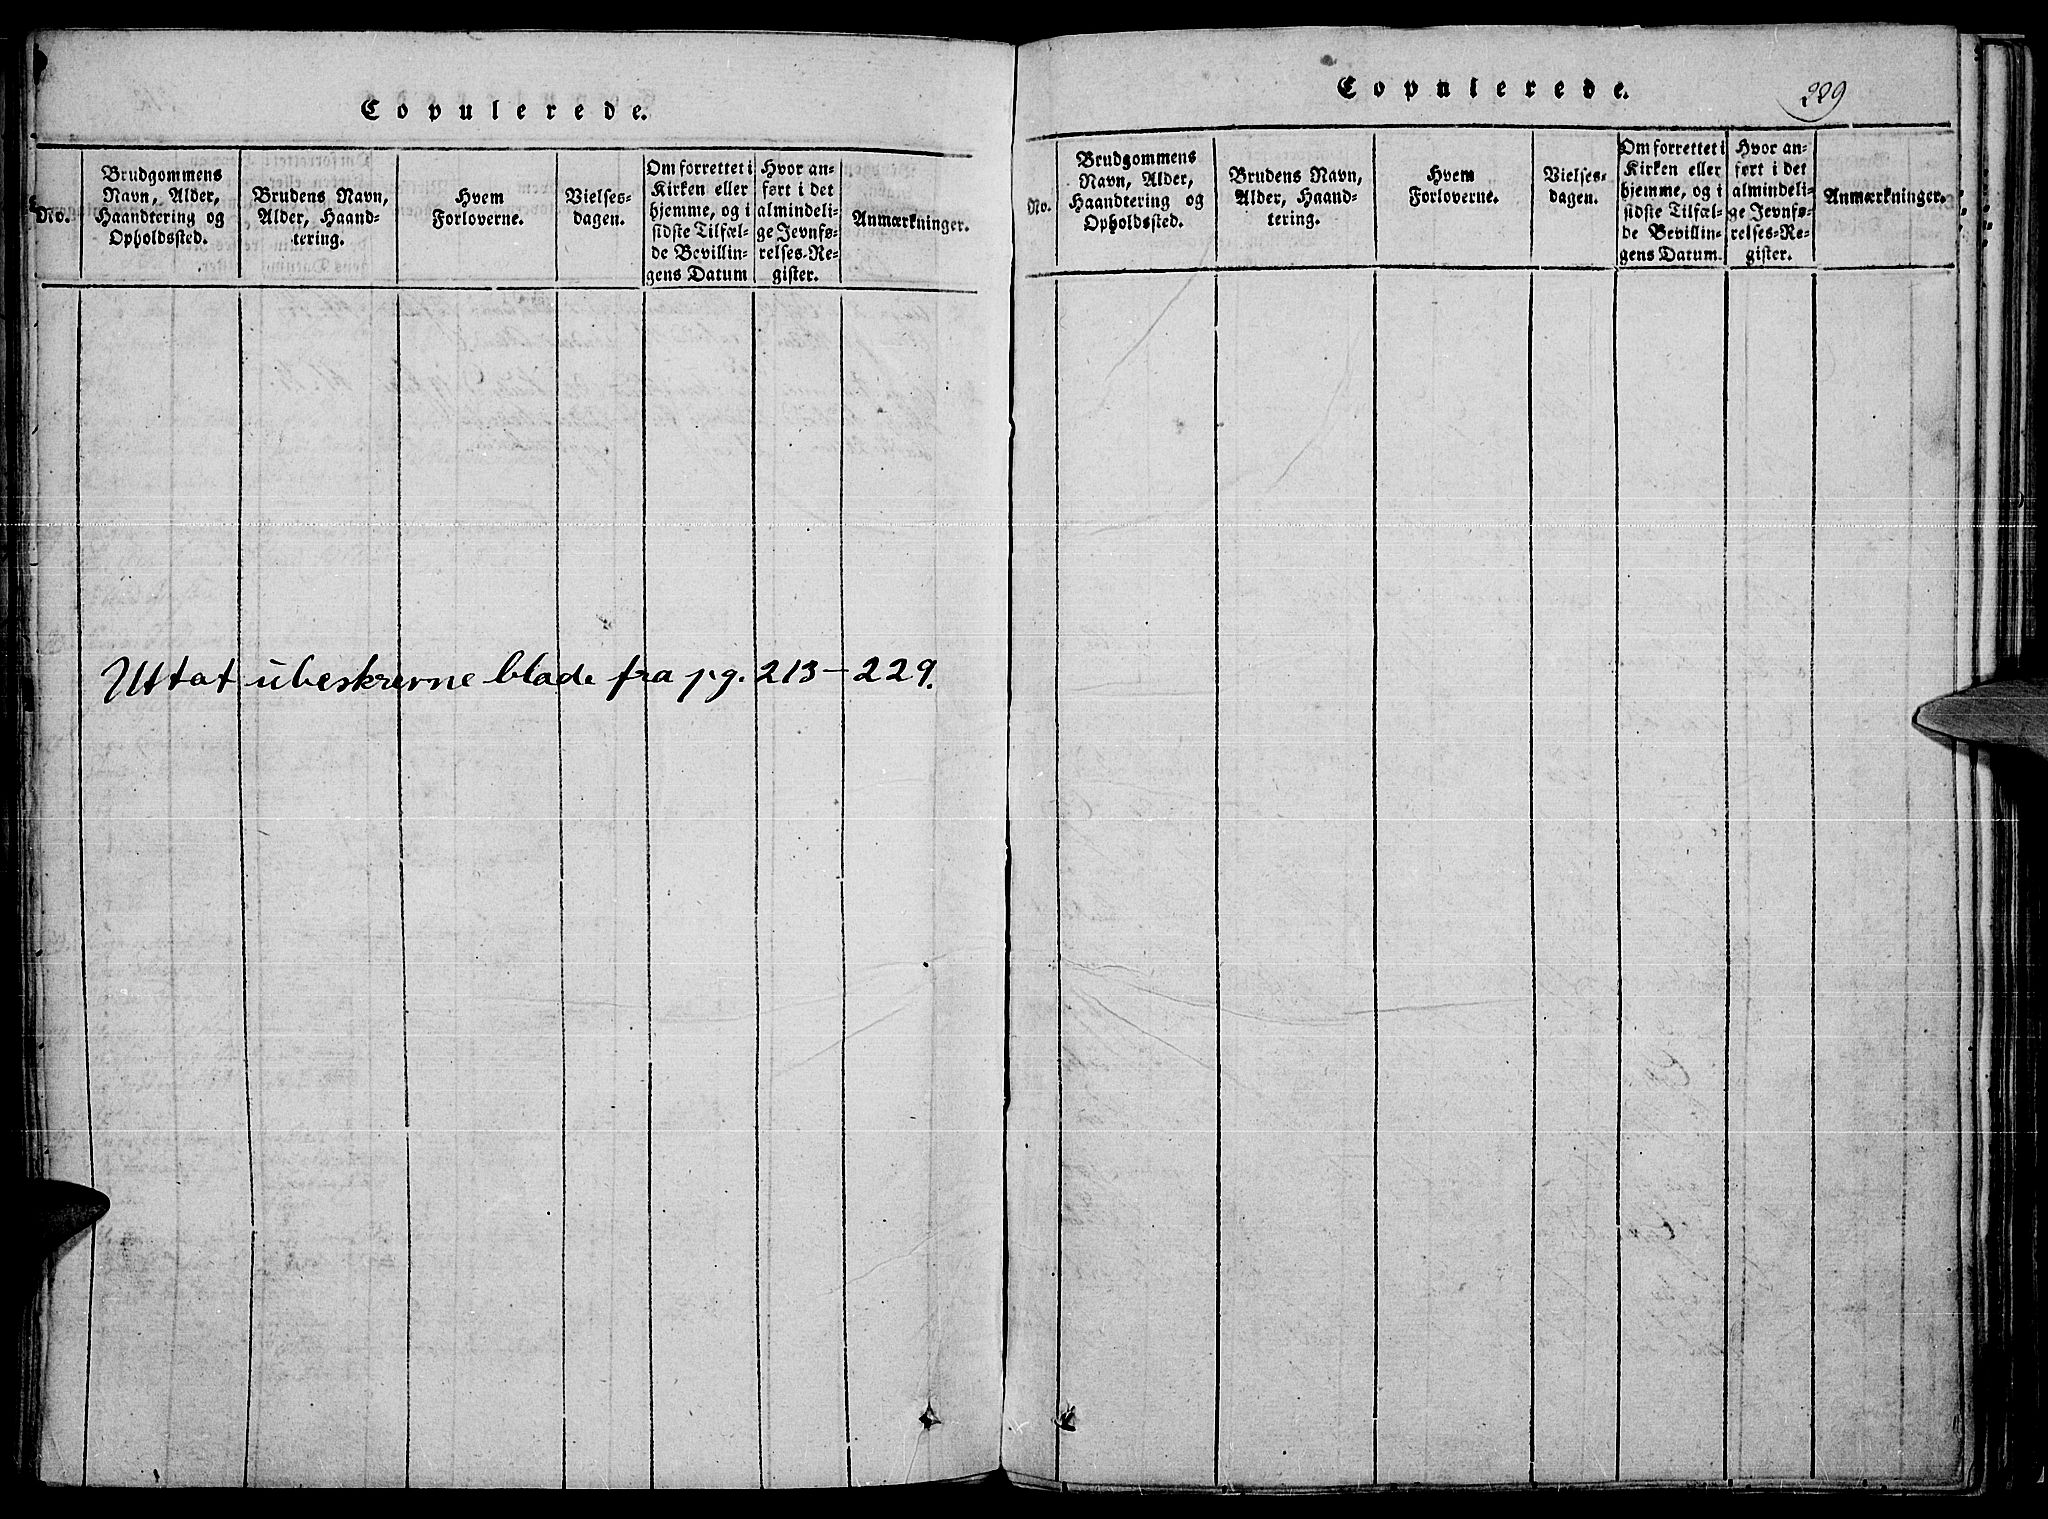 SAH, Toten prestekontor, Ministerialbok nr. 10, 1820-1828, s. 229